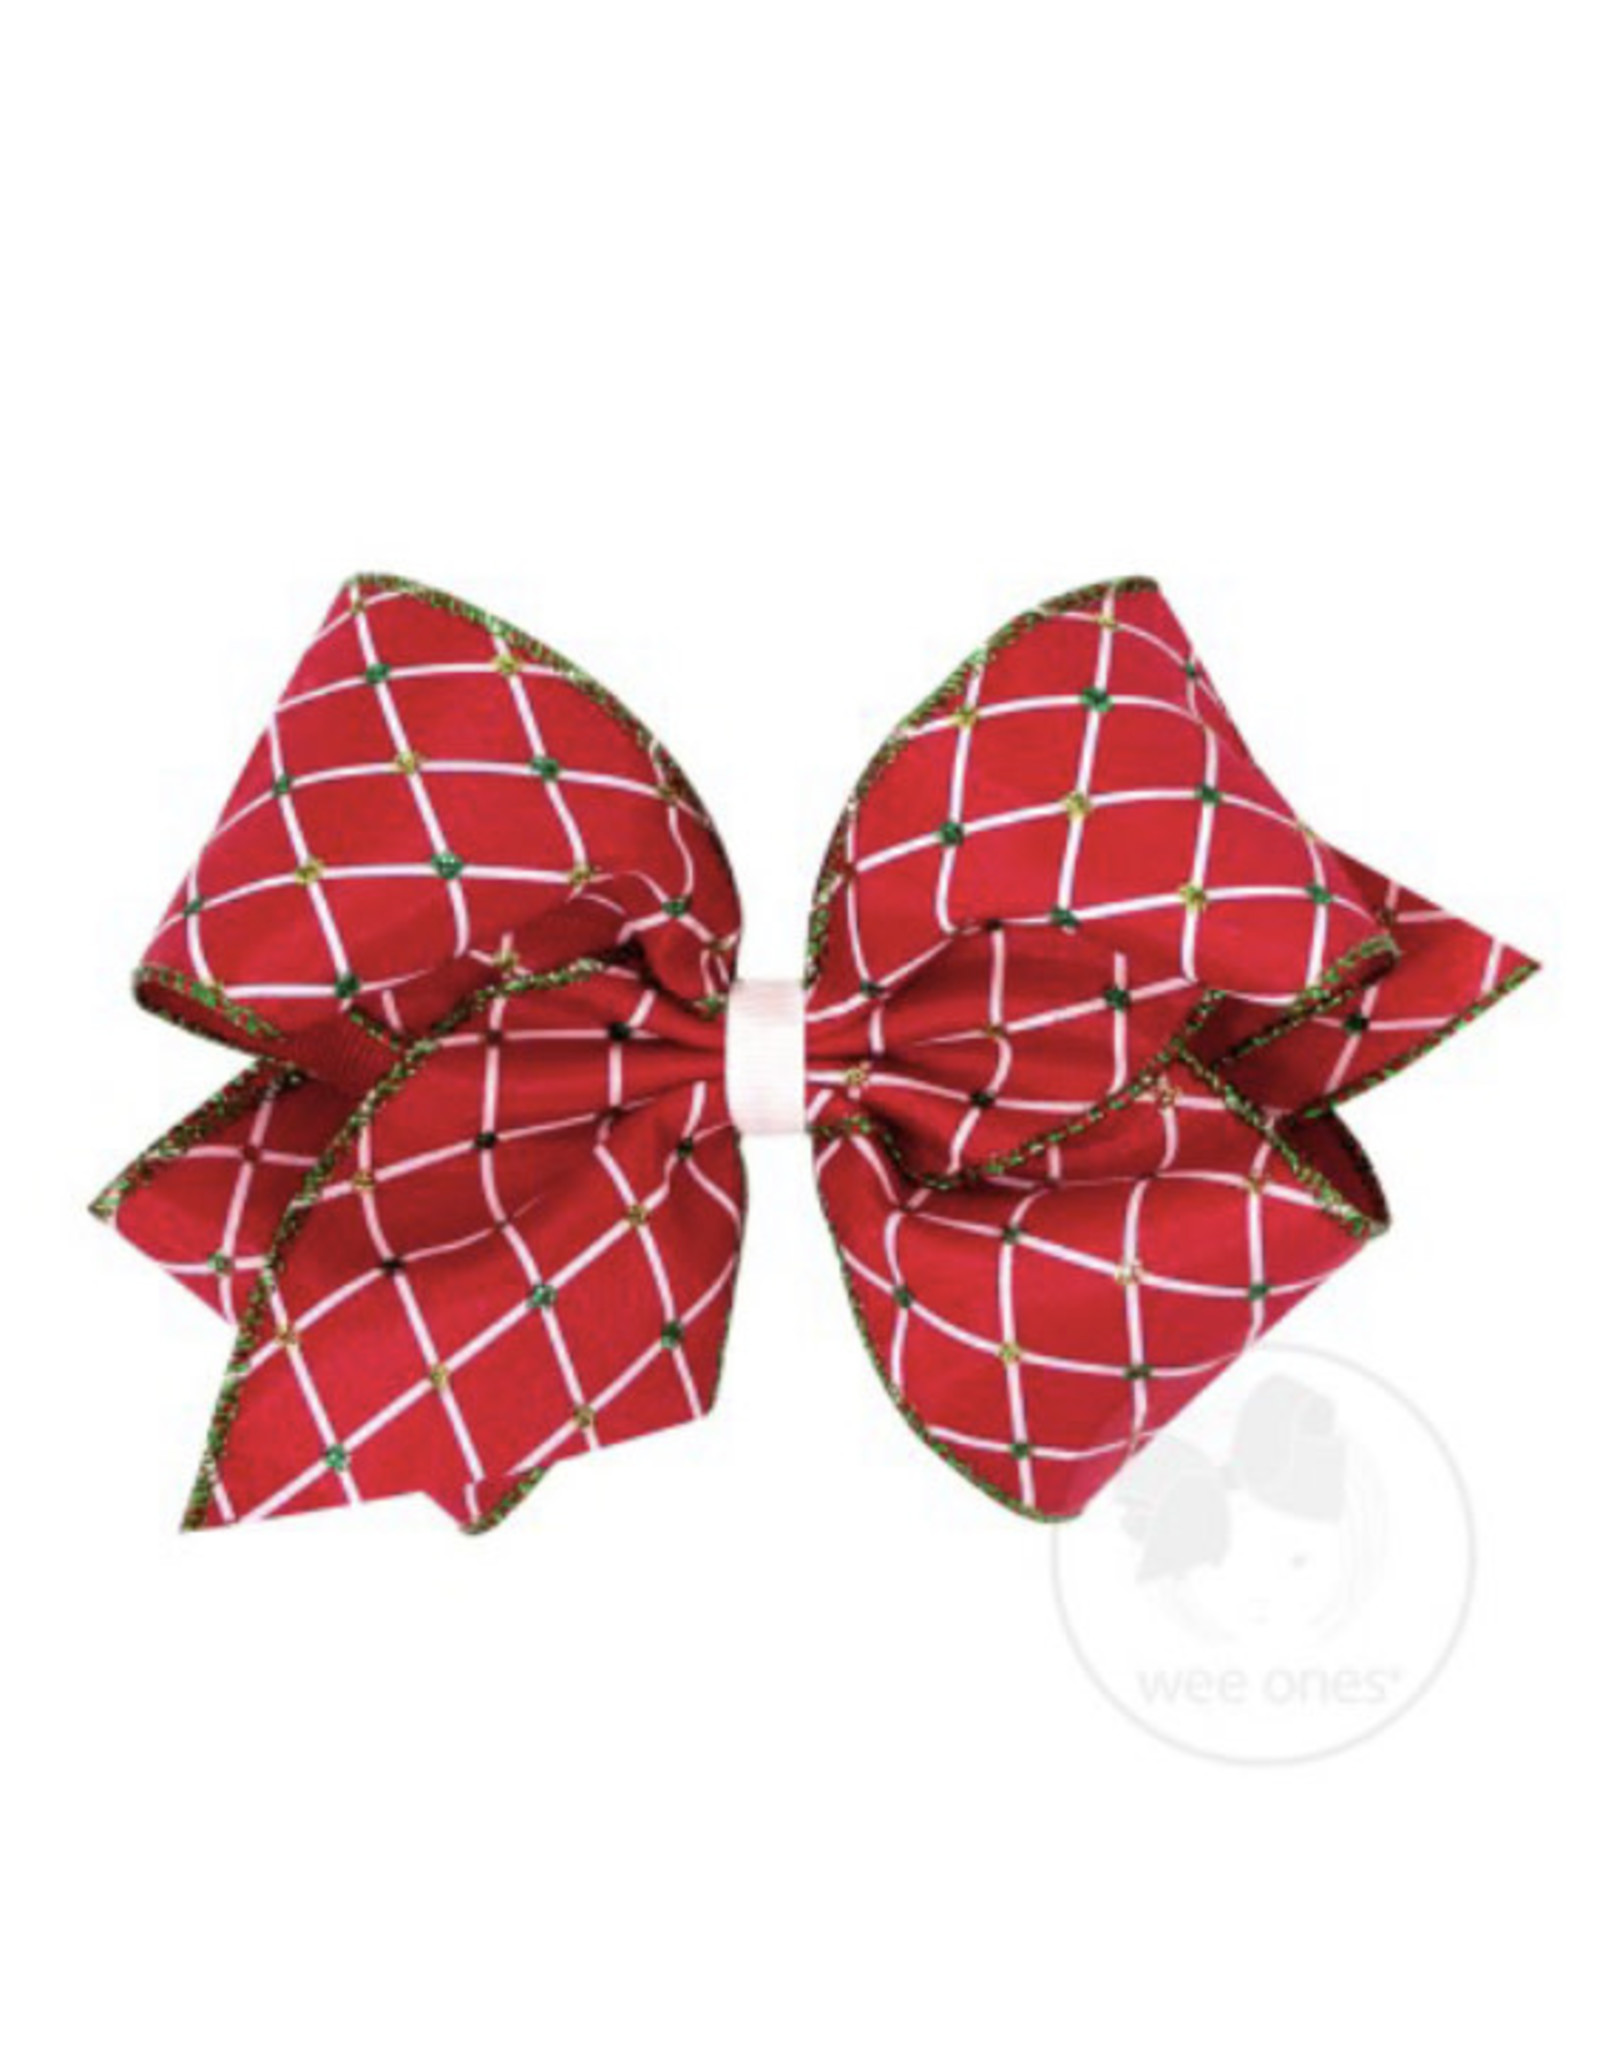 Wee Ones- King Wht/Red Diamond Seqiun Plaid Bow